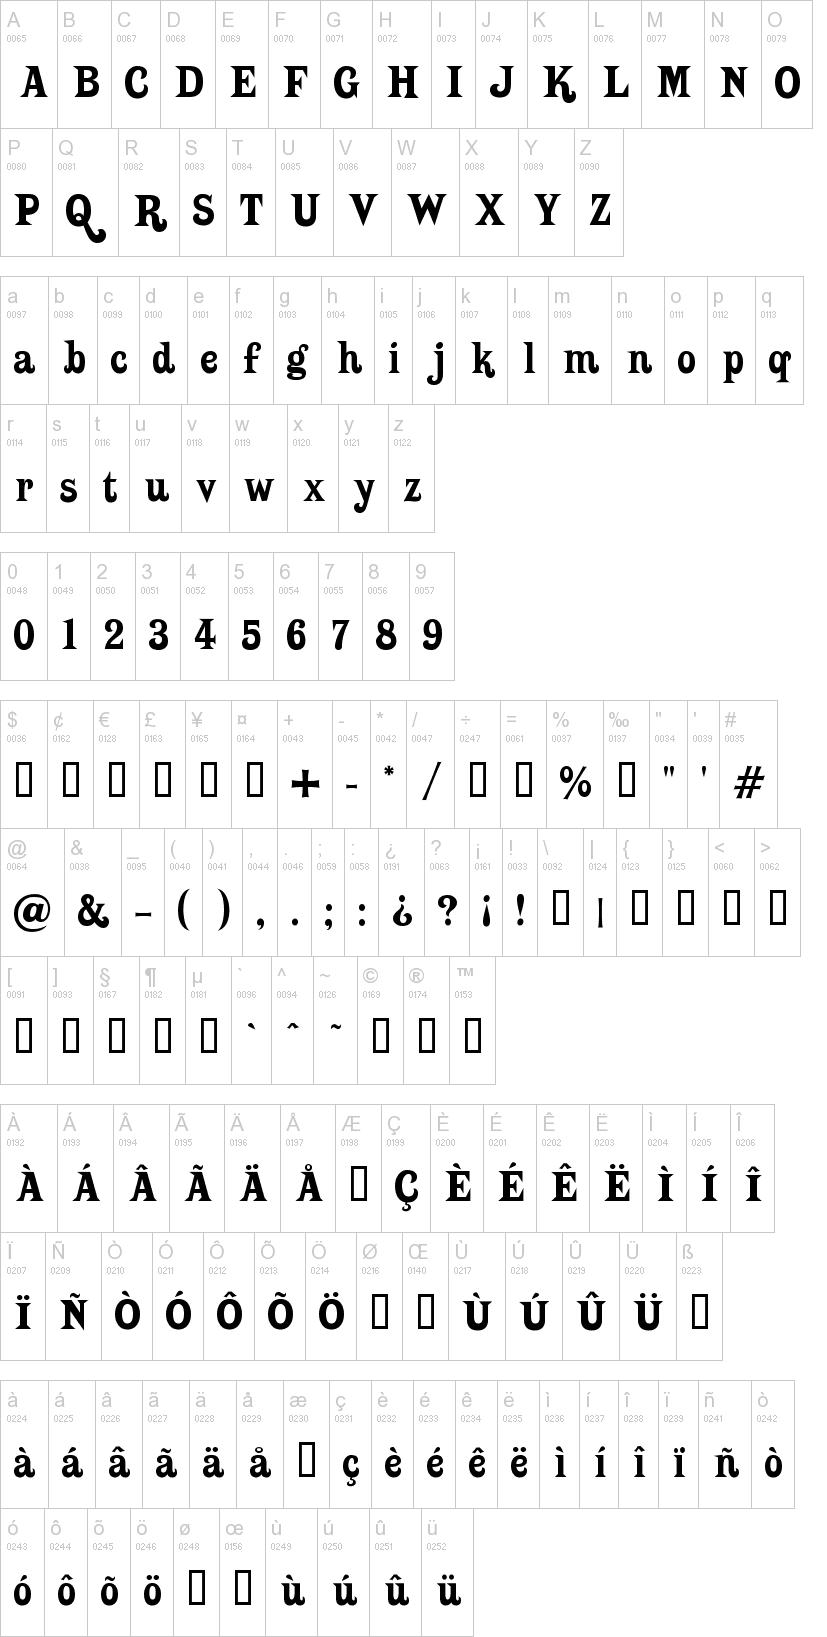 Putain font (free version of Hopeless Heart) for Kingdom